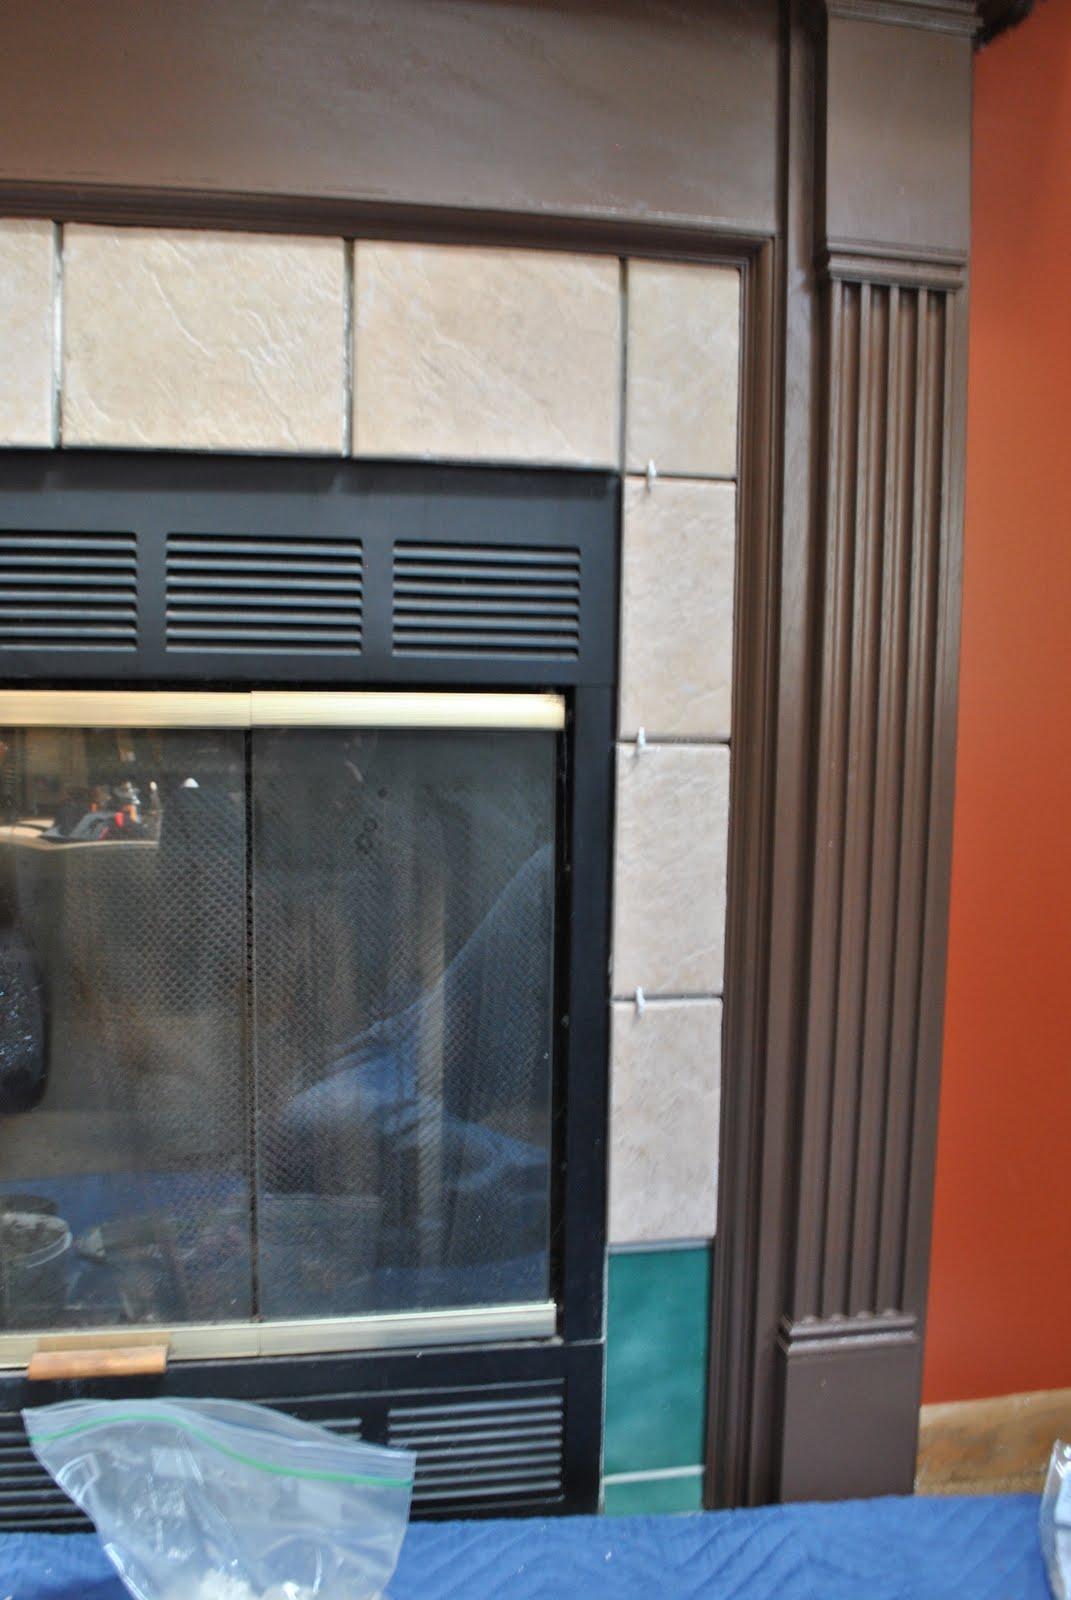 Diy fireplace surround transformation jenna burger solutioingenieria Image collections